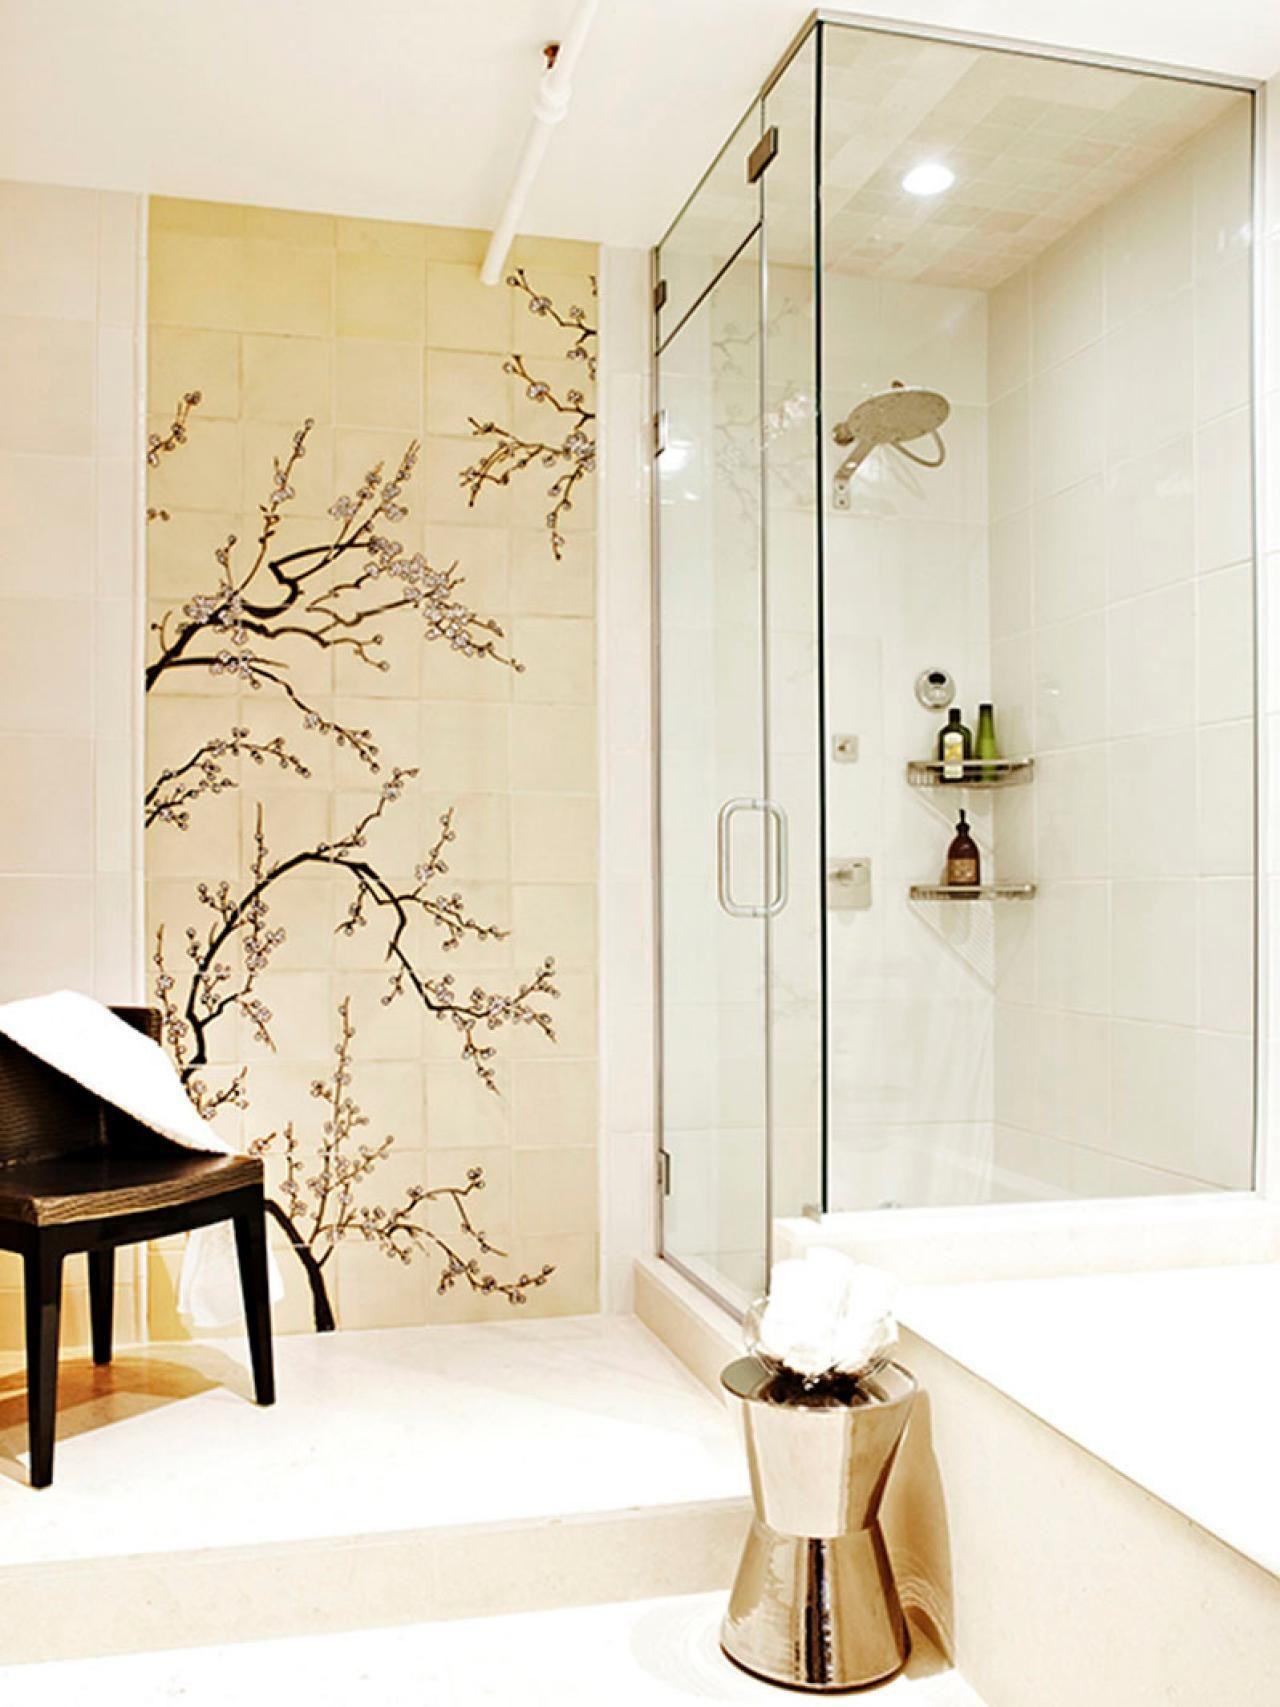 Asian-Style Bathrooms | Splish Splash | Pinterest | Asian mosaic ...